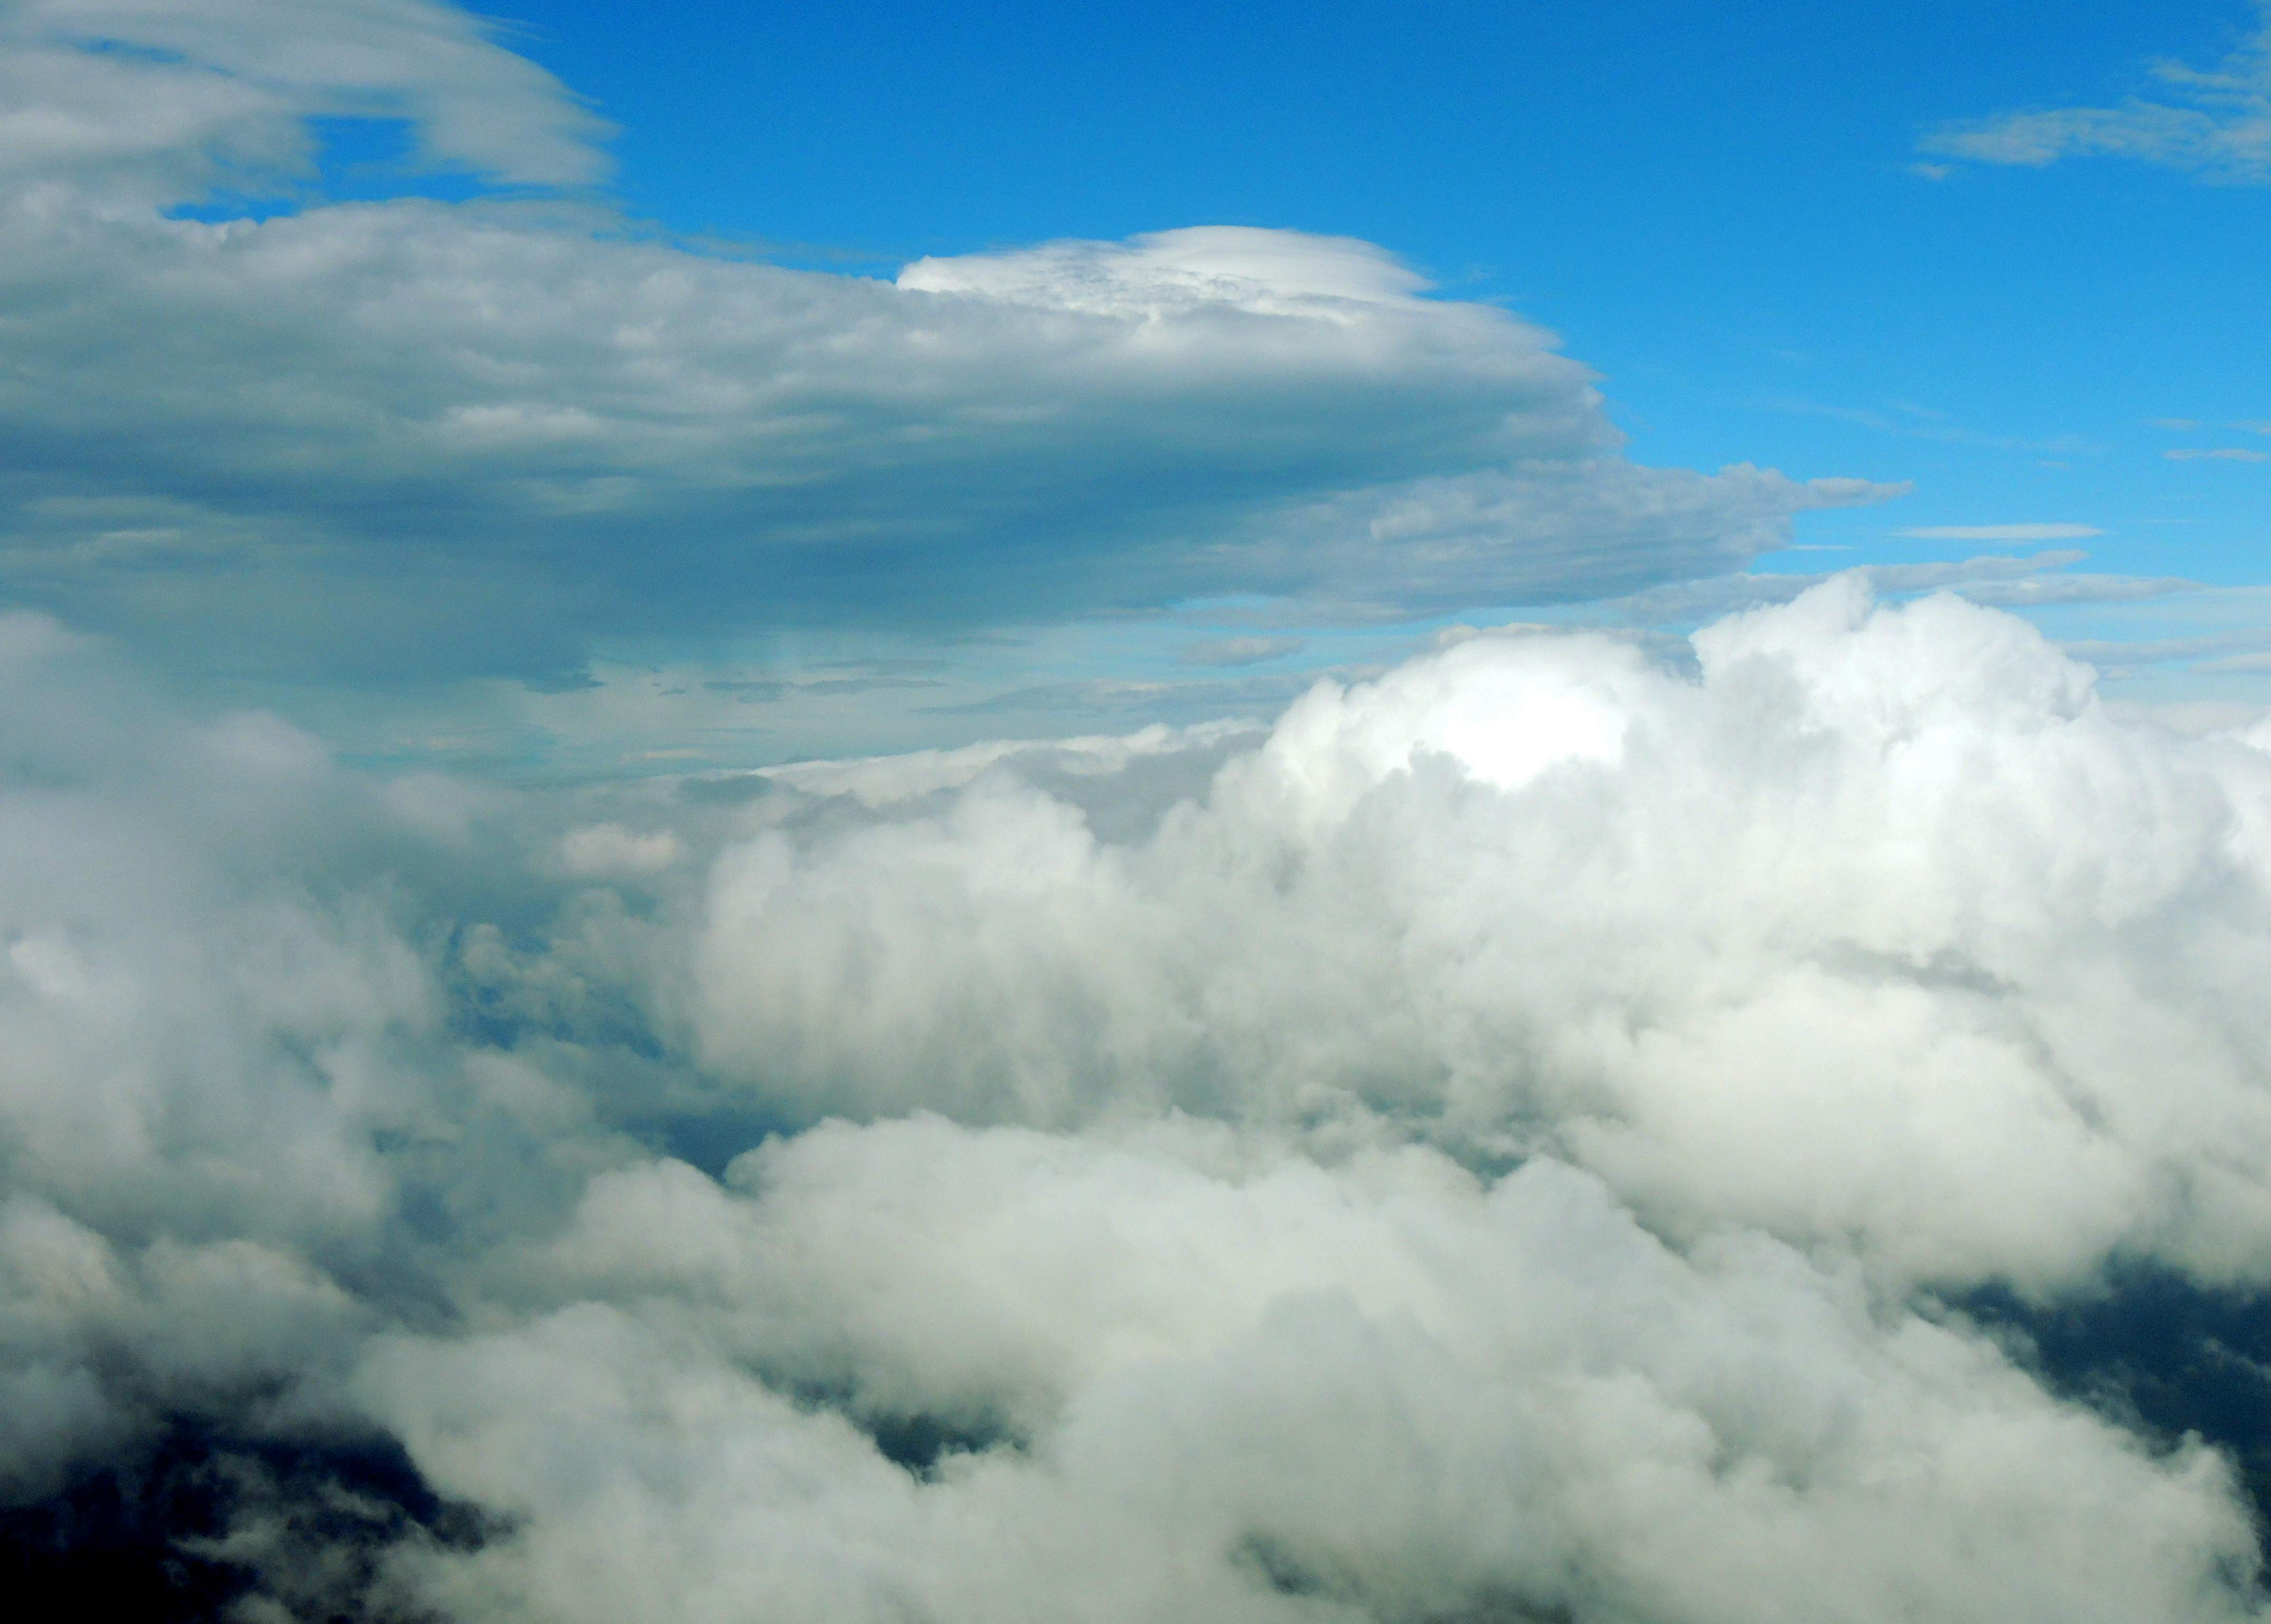 Heading to Charleston WV at 7000 feet